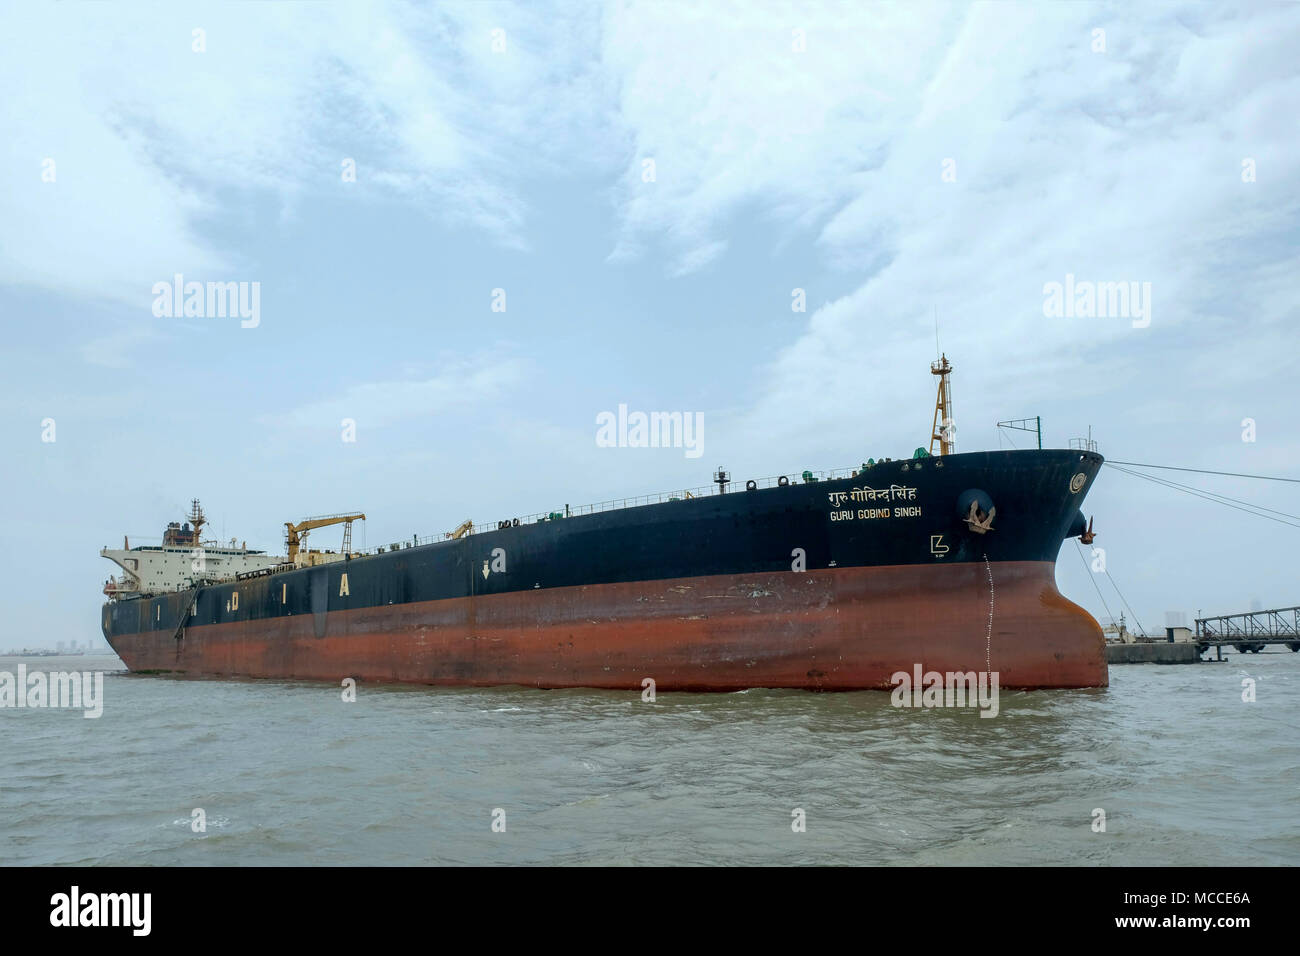 The Guru Gobind Singh crude oil tanker in the port in Mumbai, India - Stock Image